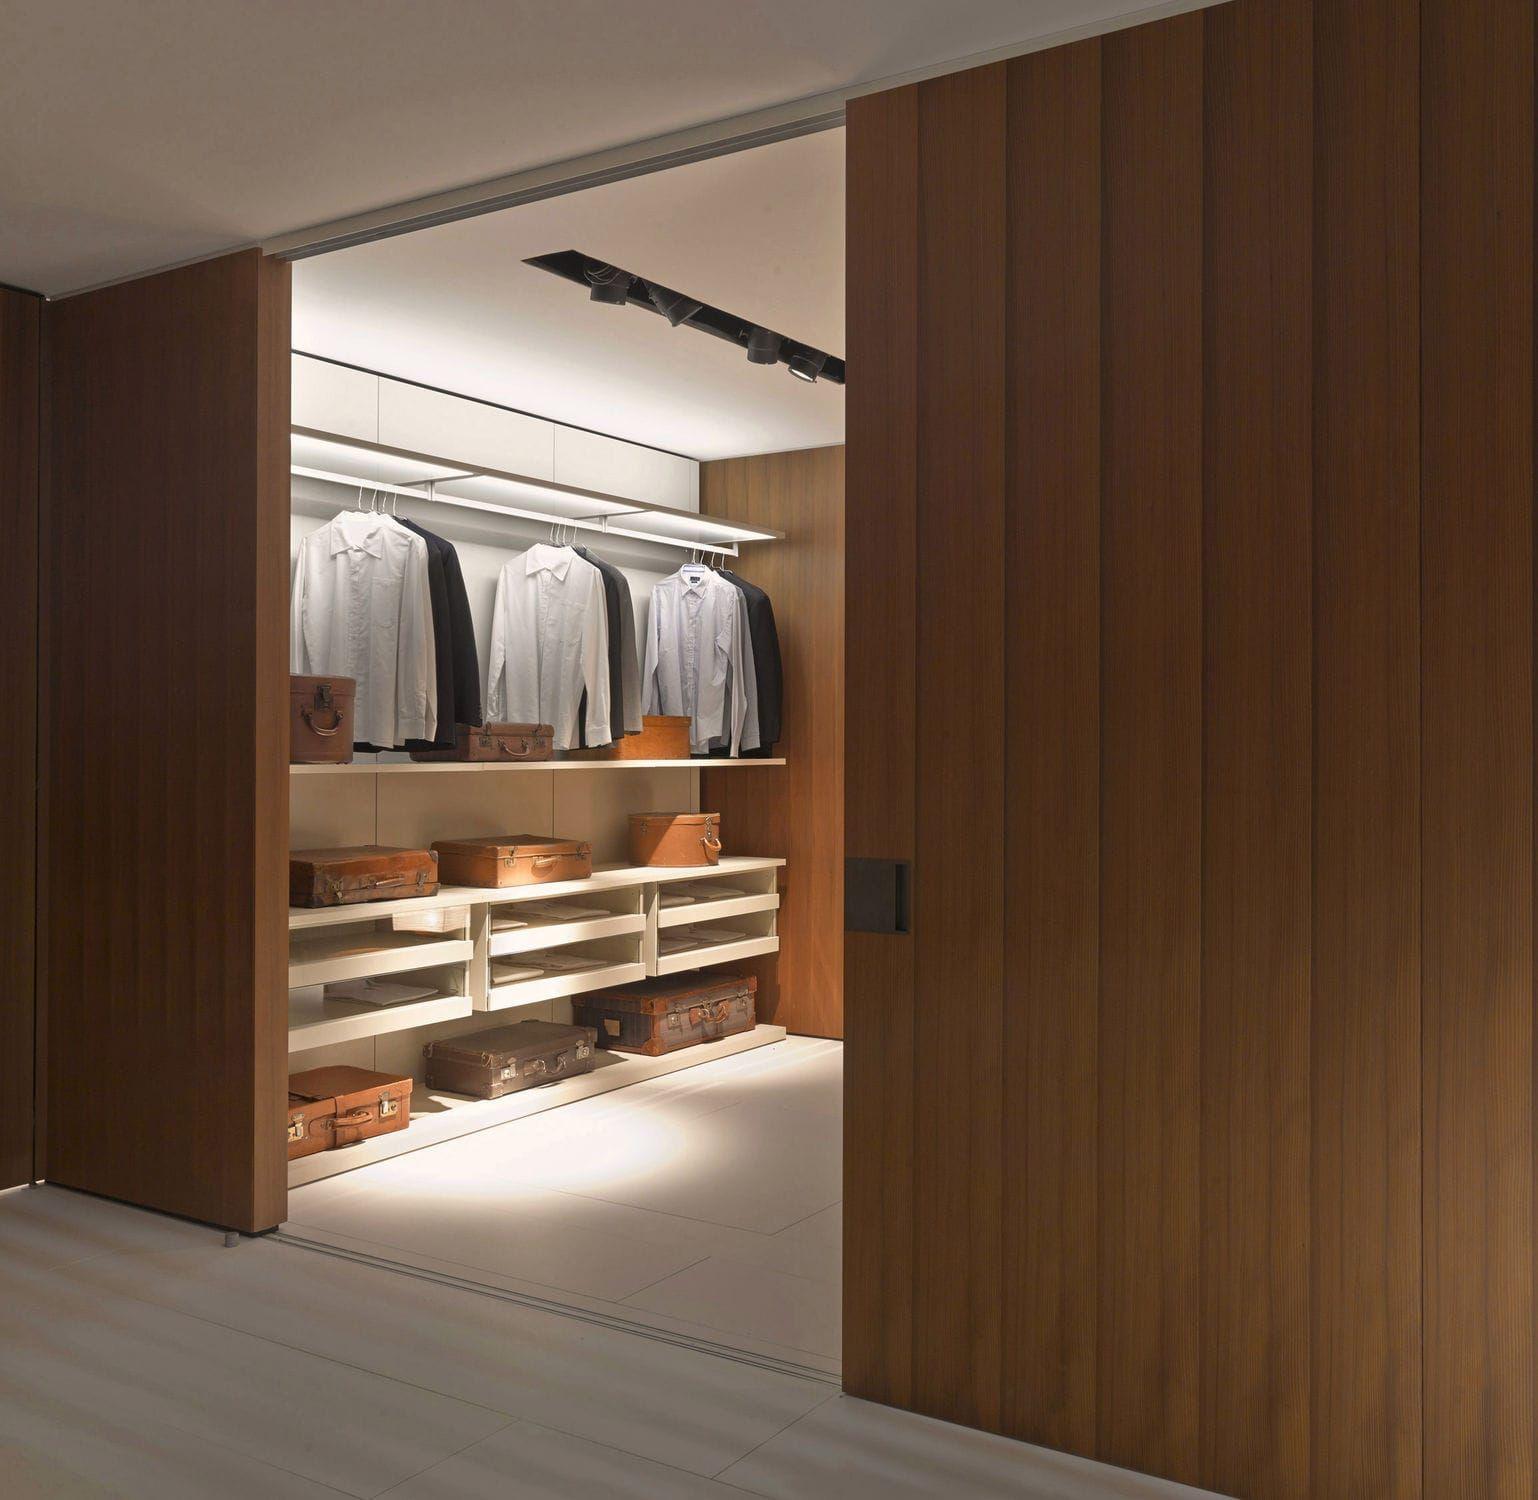 Closet door for walk in wardrobes sliding oak SHIFT by De a